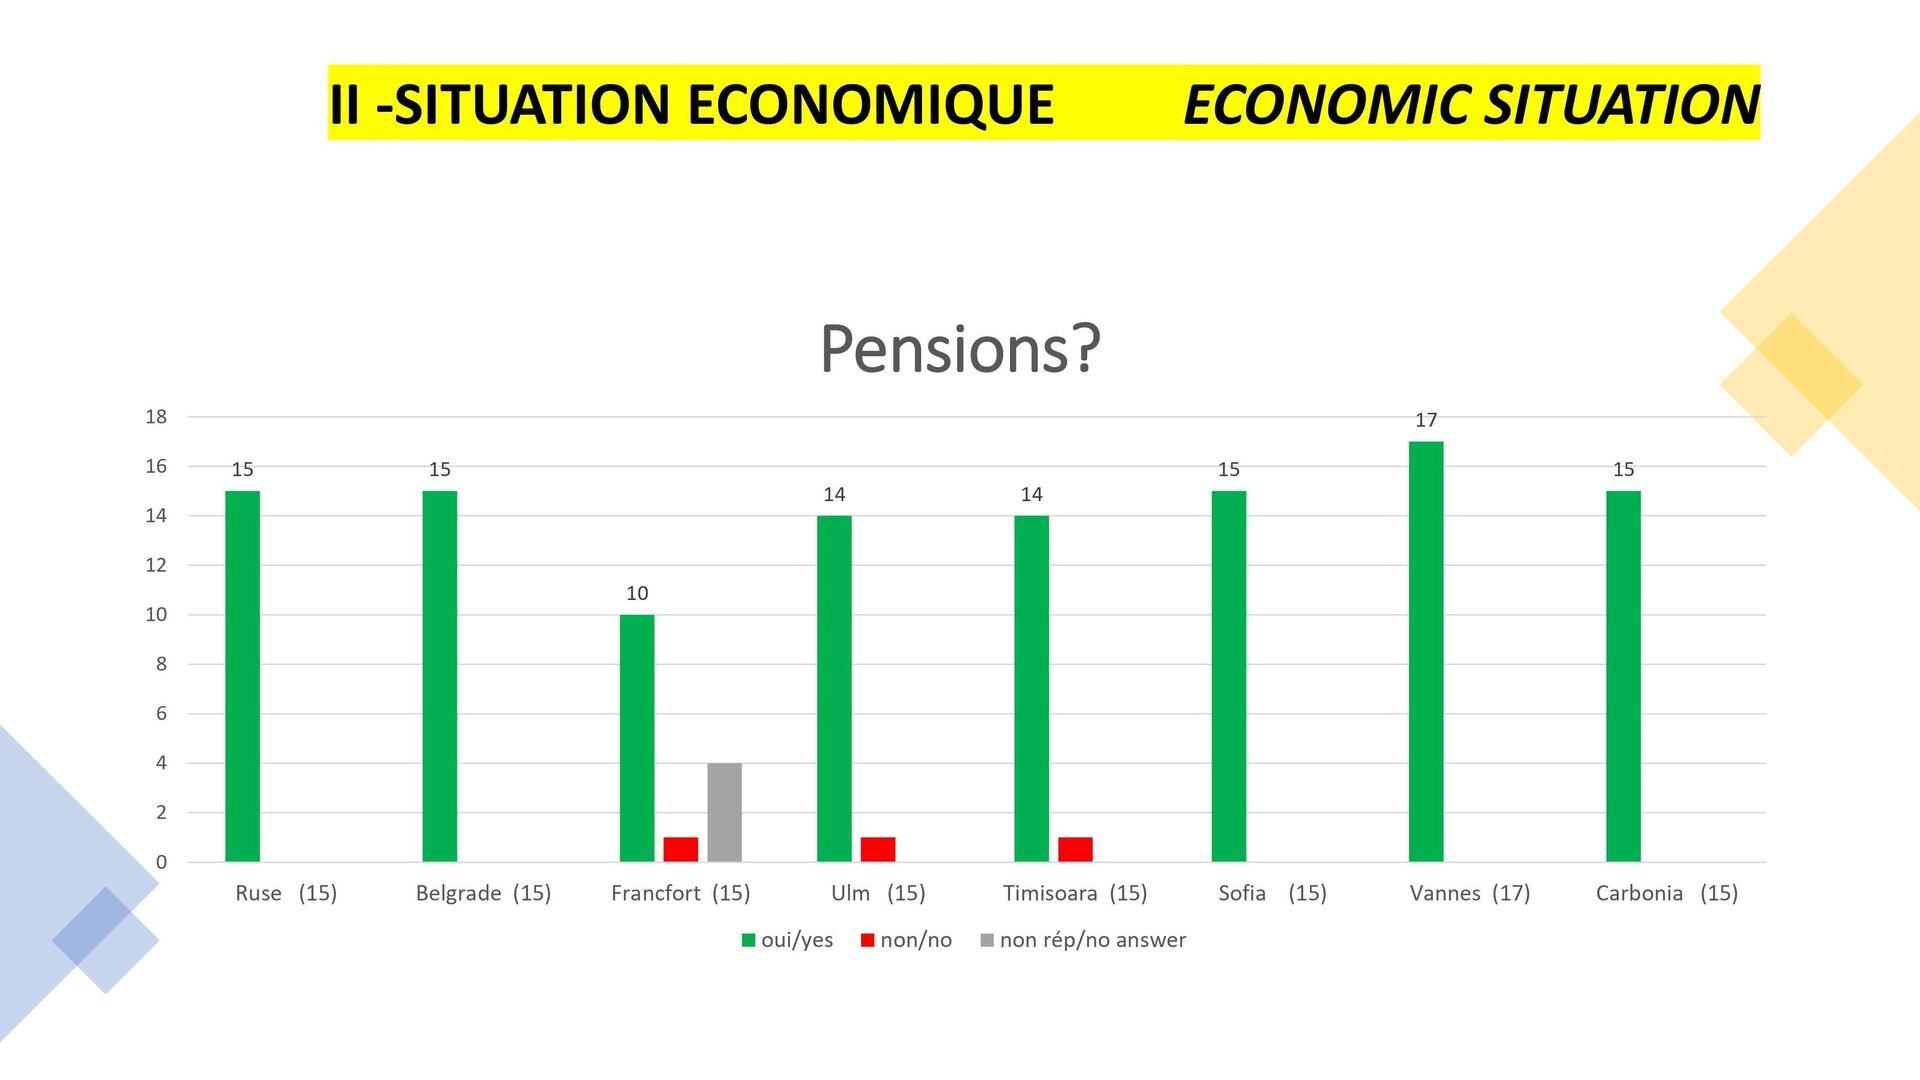 Economic situation